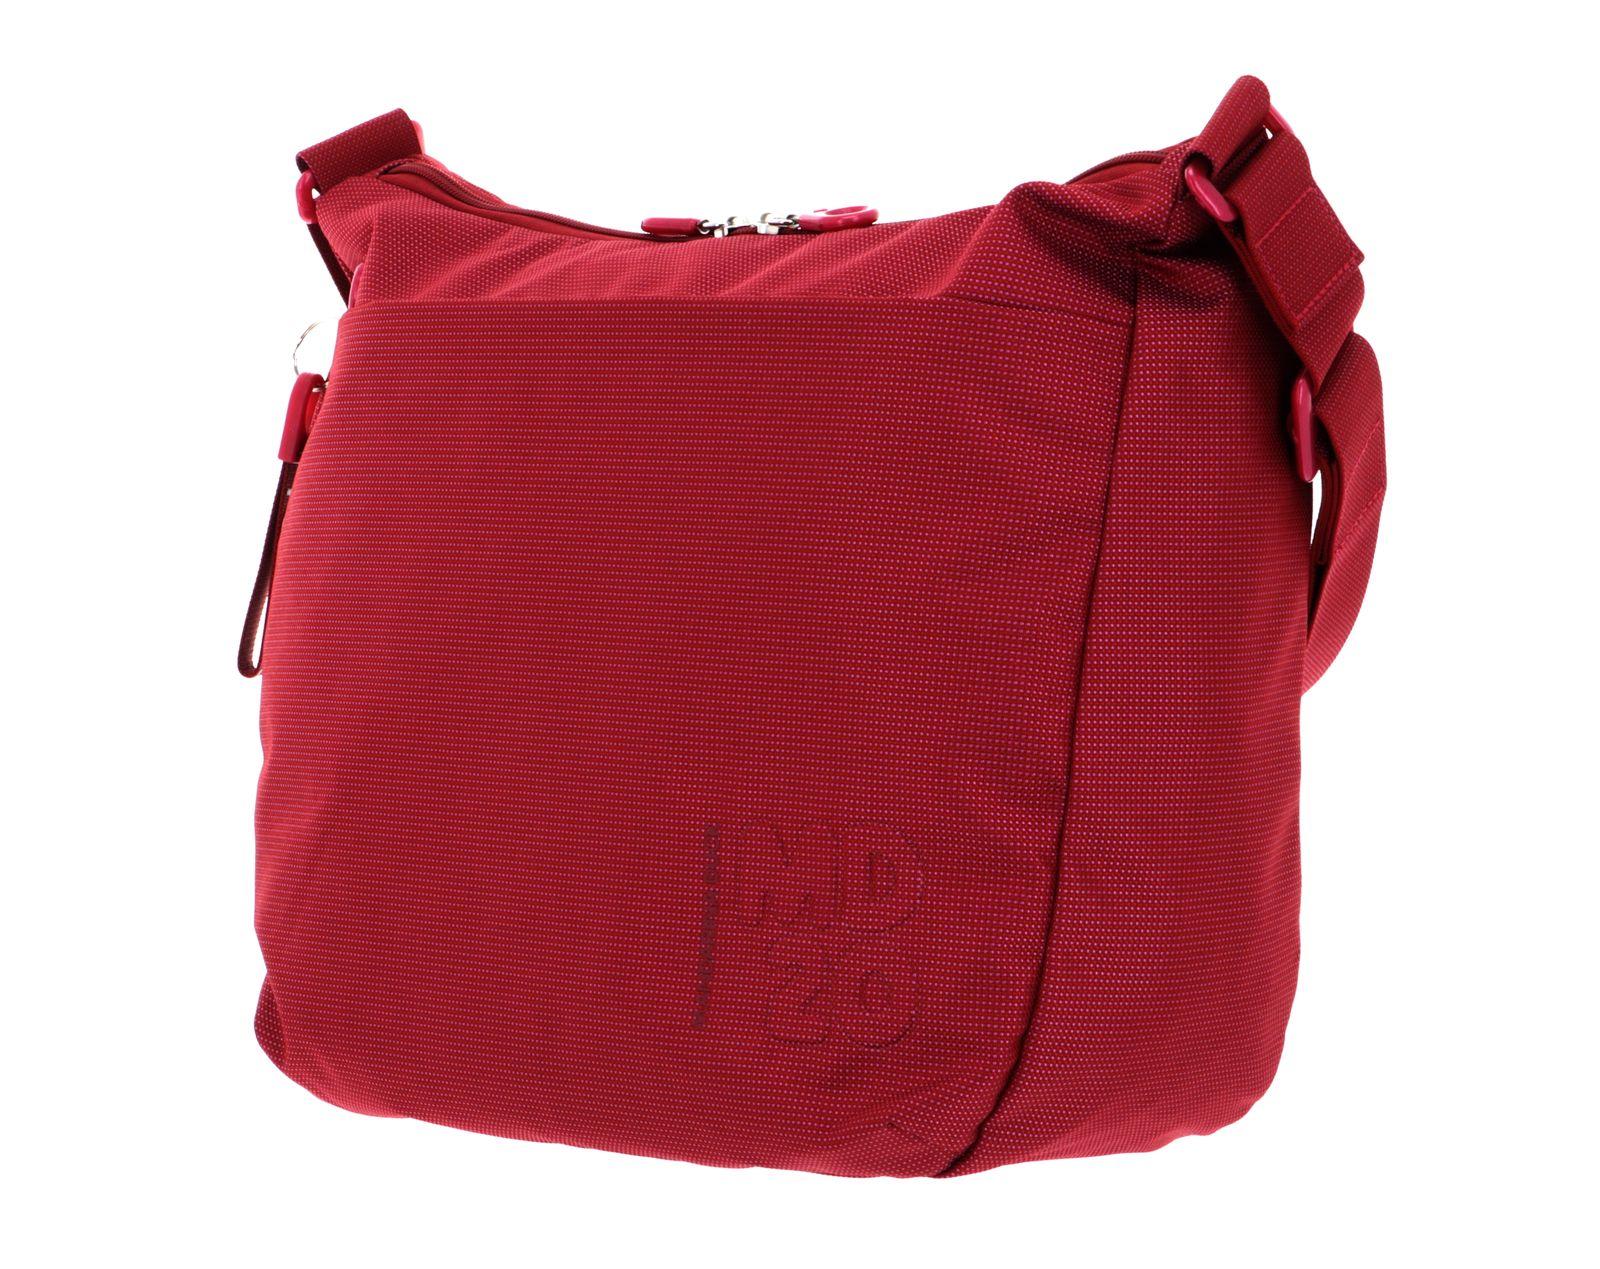 MANDARINA DUCK MD20 Hobo Bag Cerise